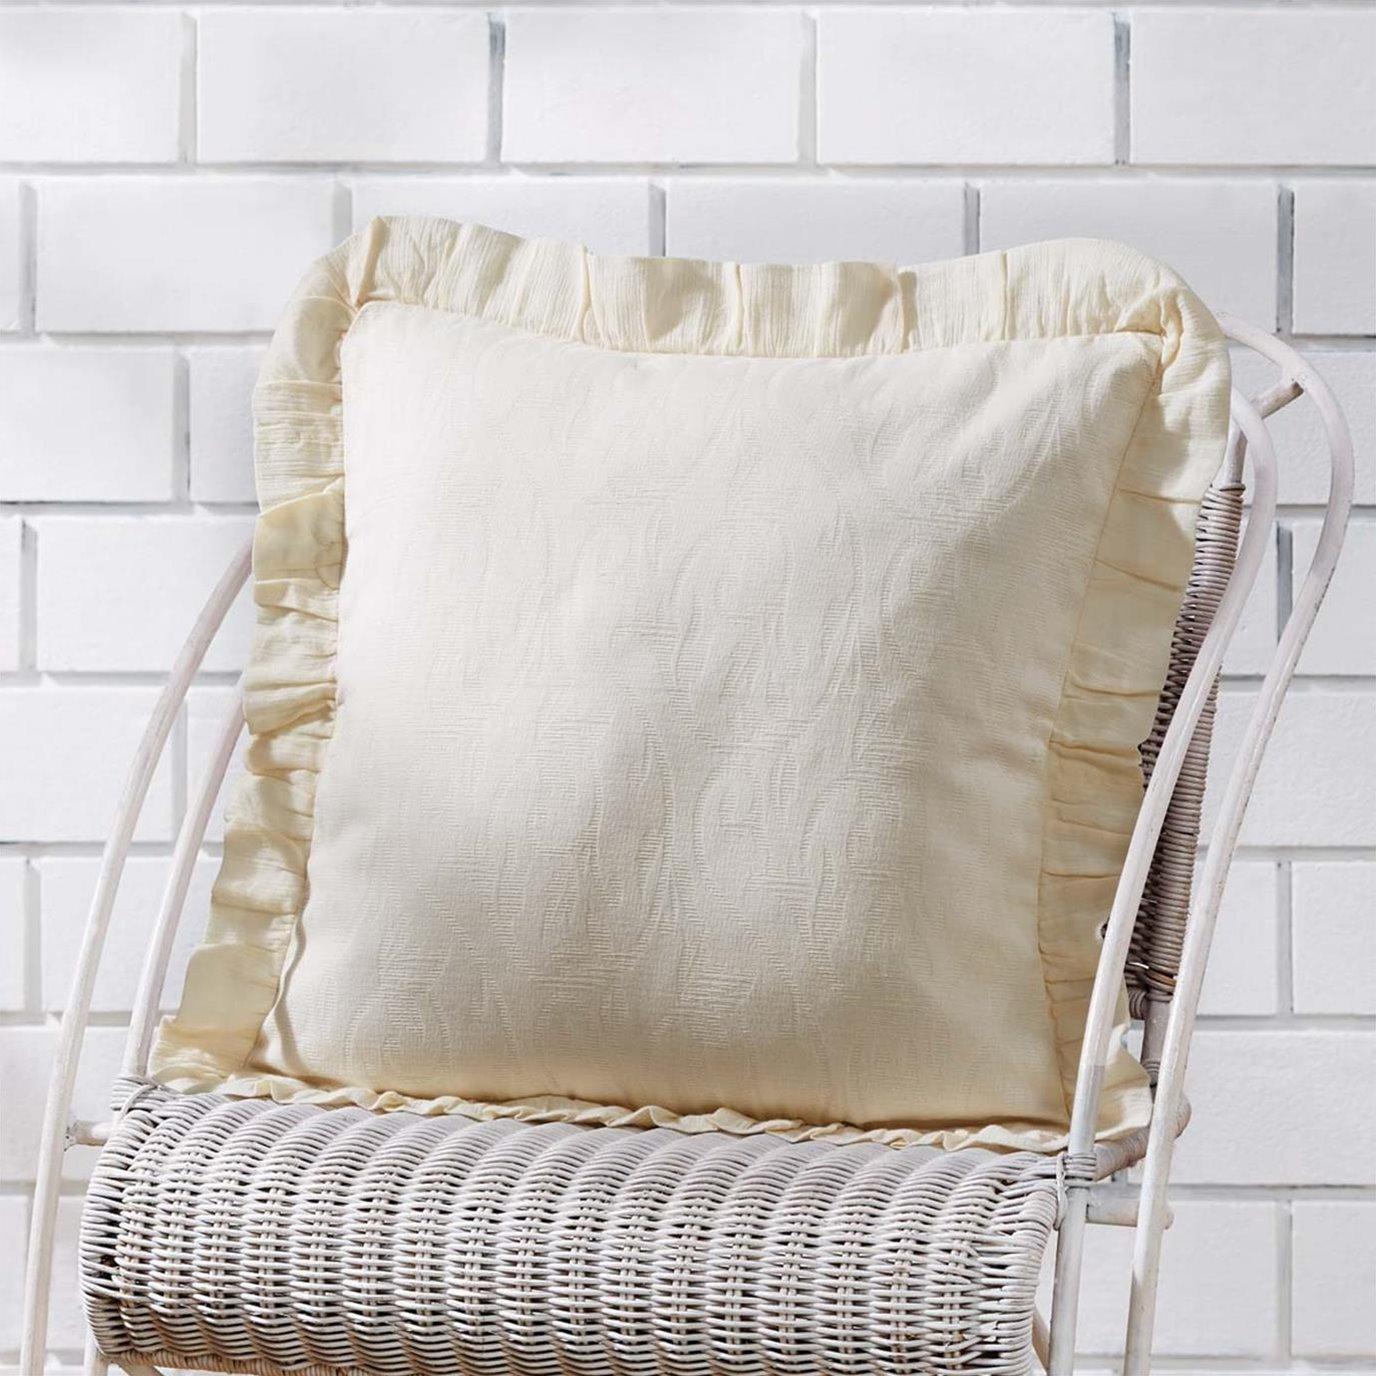 Abigail Ruffle Pillow Cover 18x18